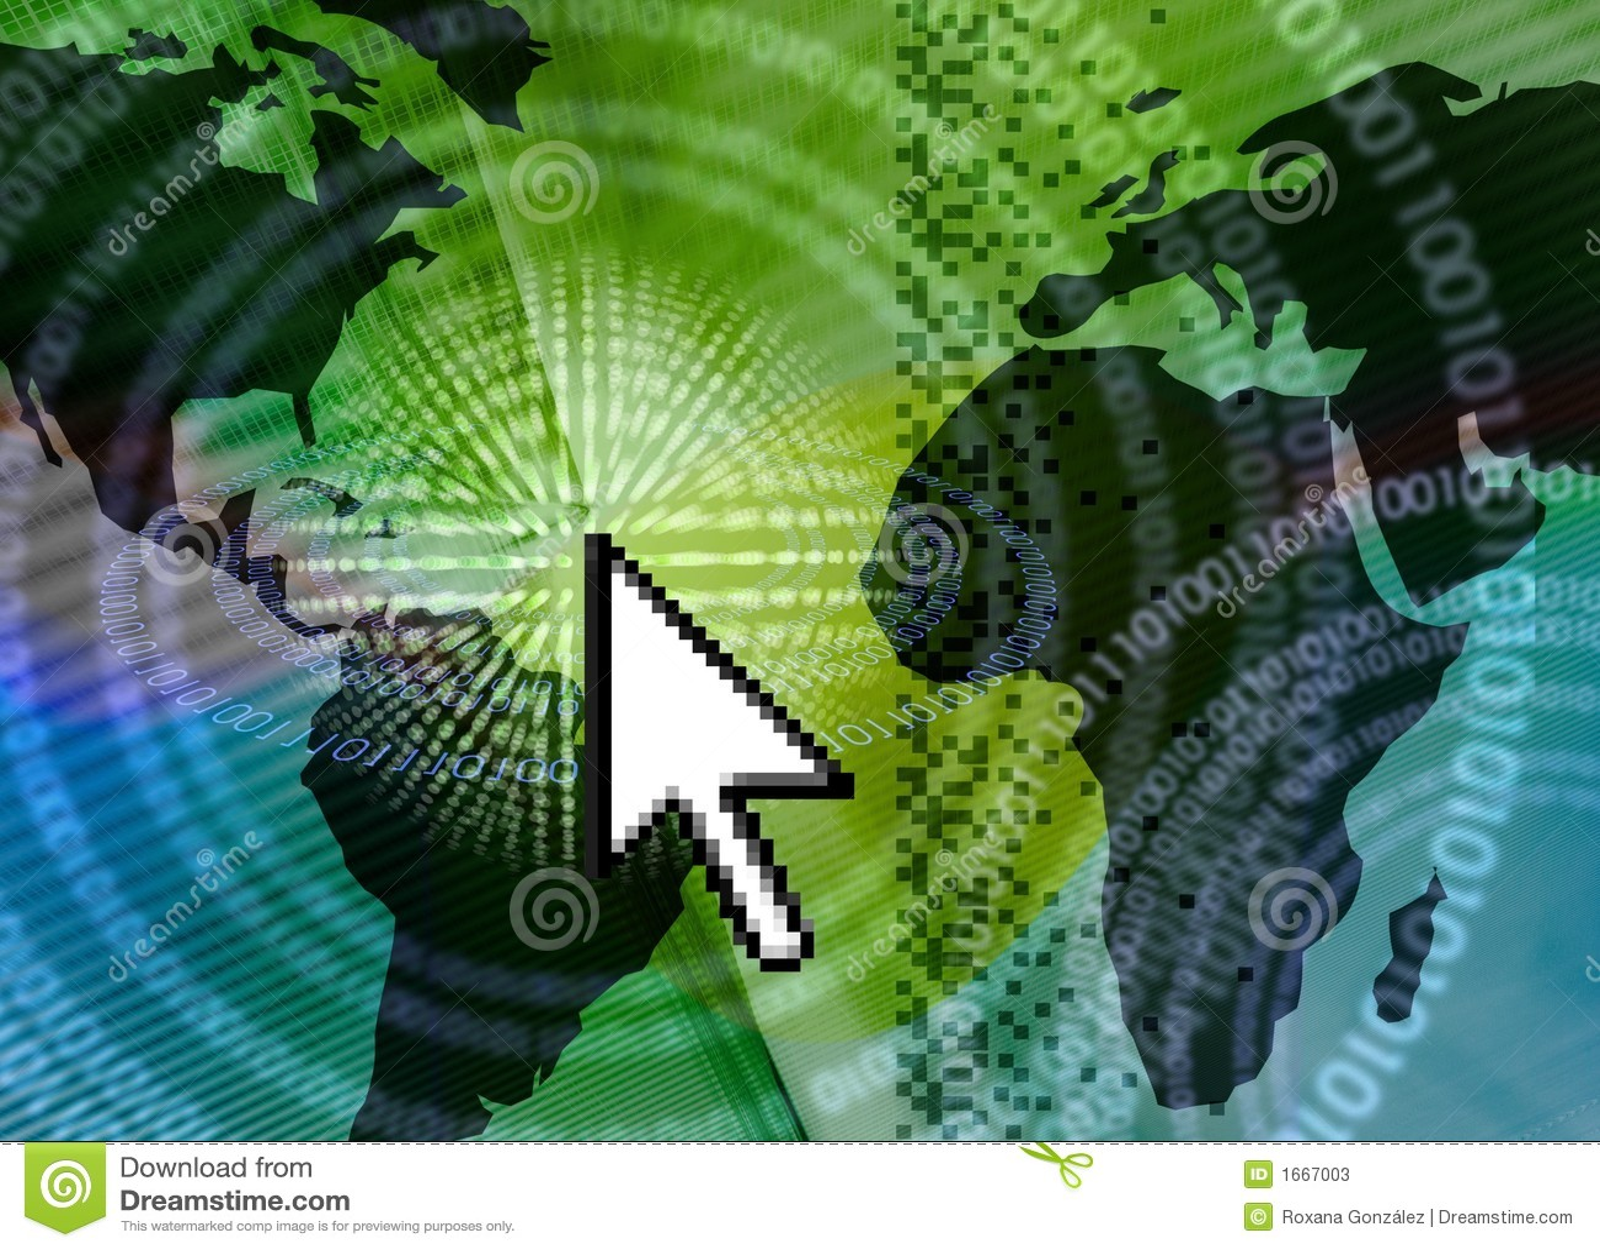 ELE mundo da tecnologia